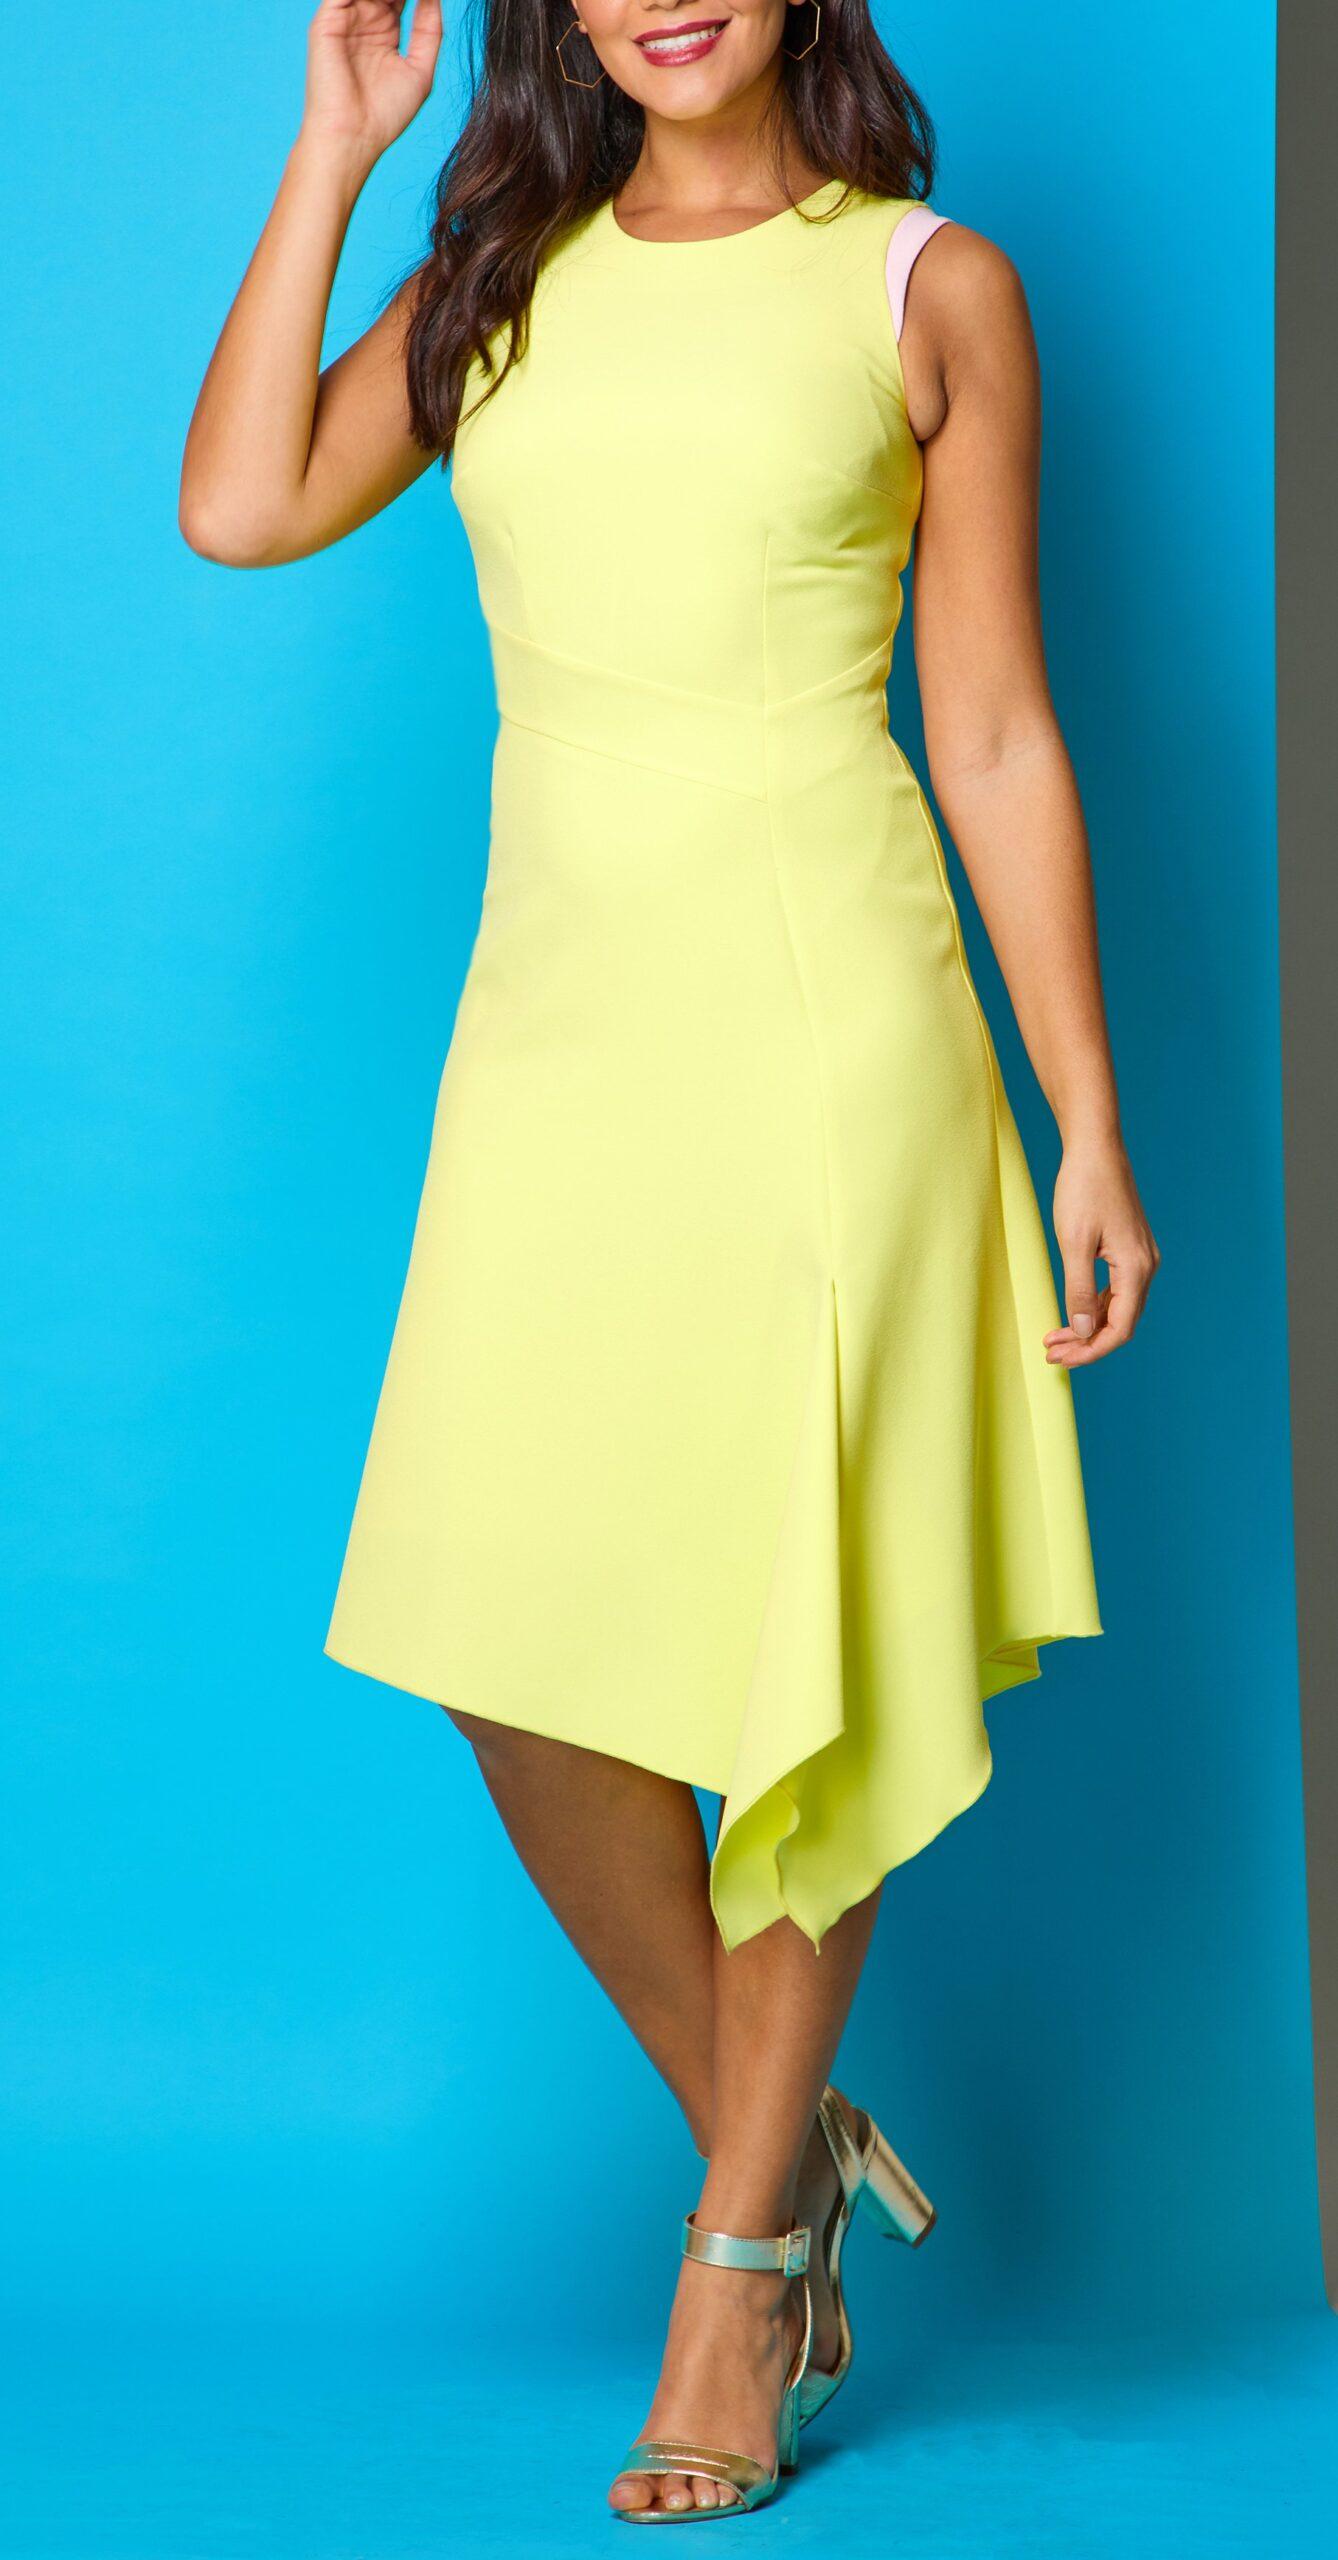 Mellaris | Adelle Dress - Yellow